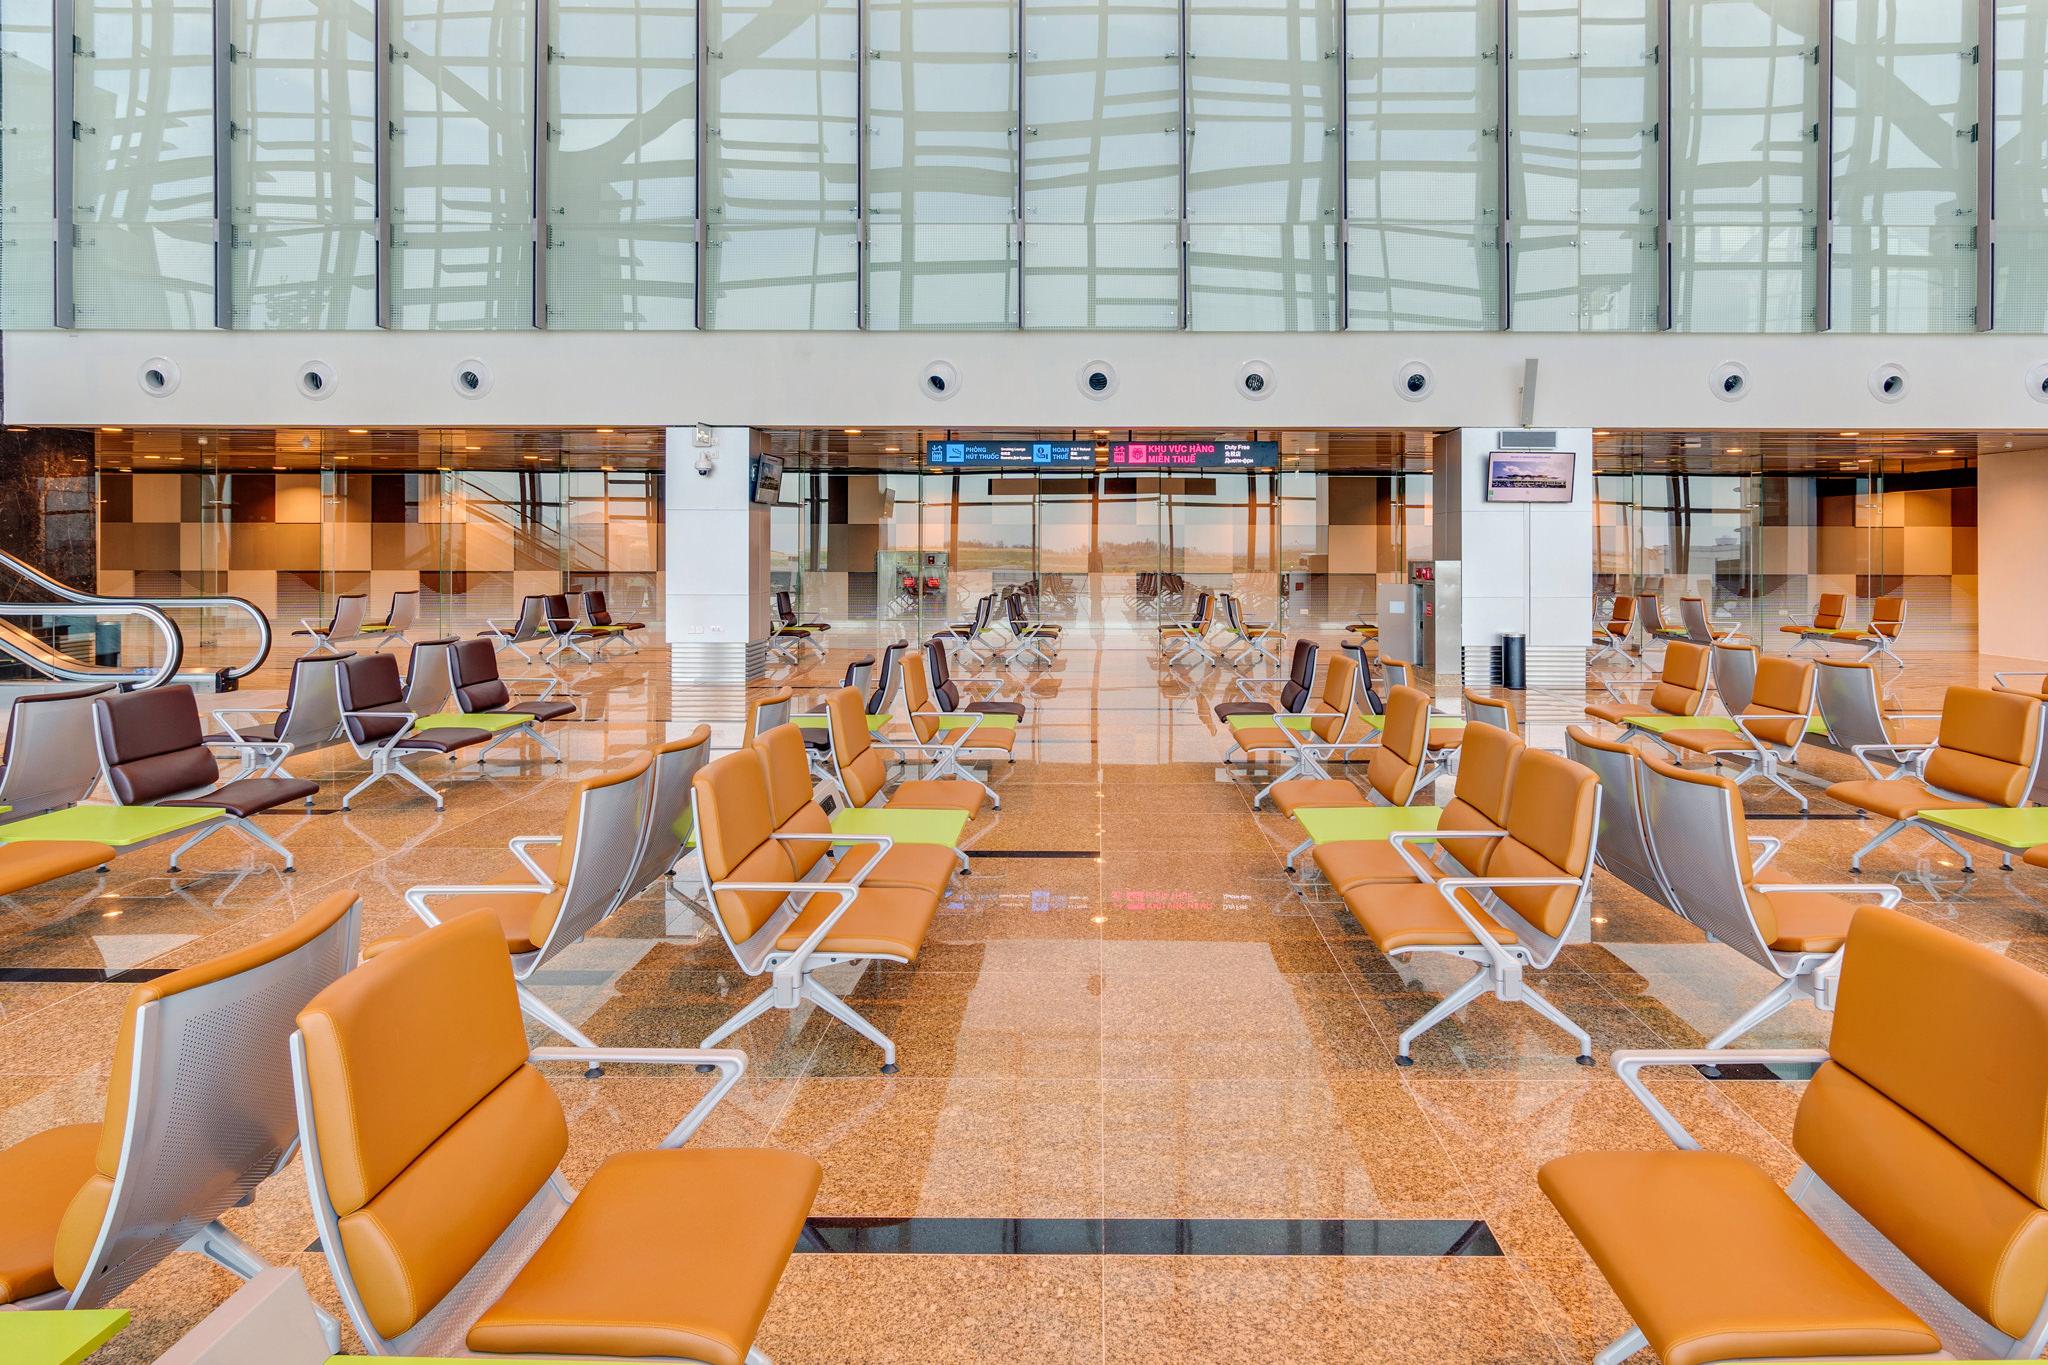 20180626 - Cam Ranh Airport - Architecture - 0357.jpg